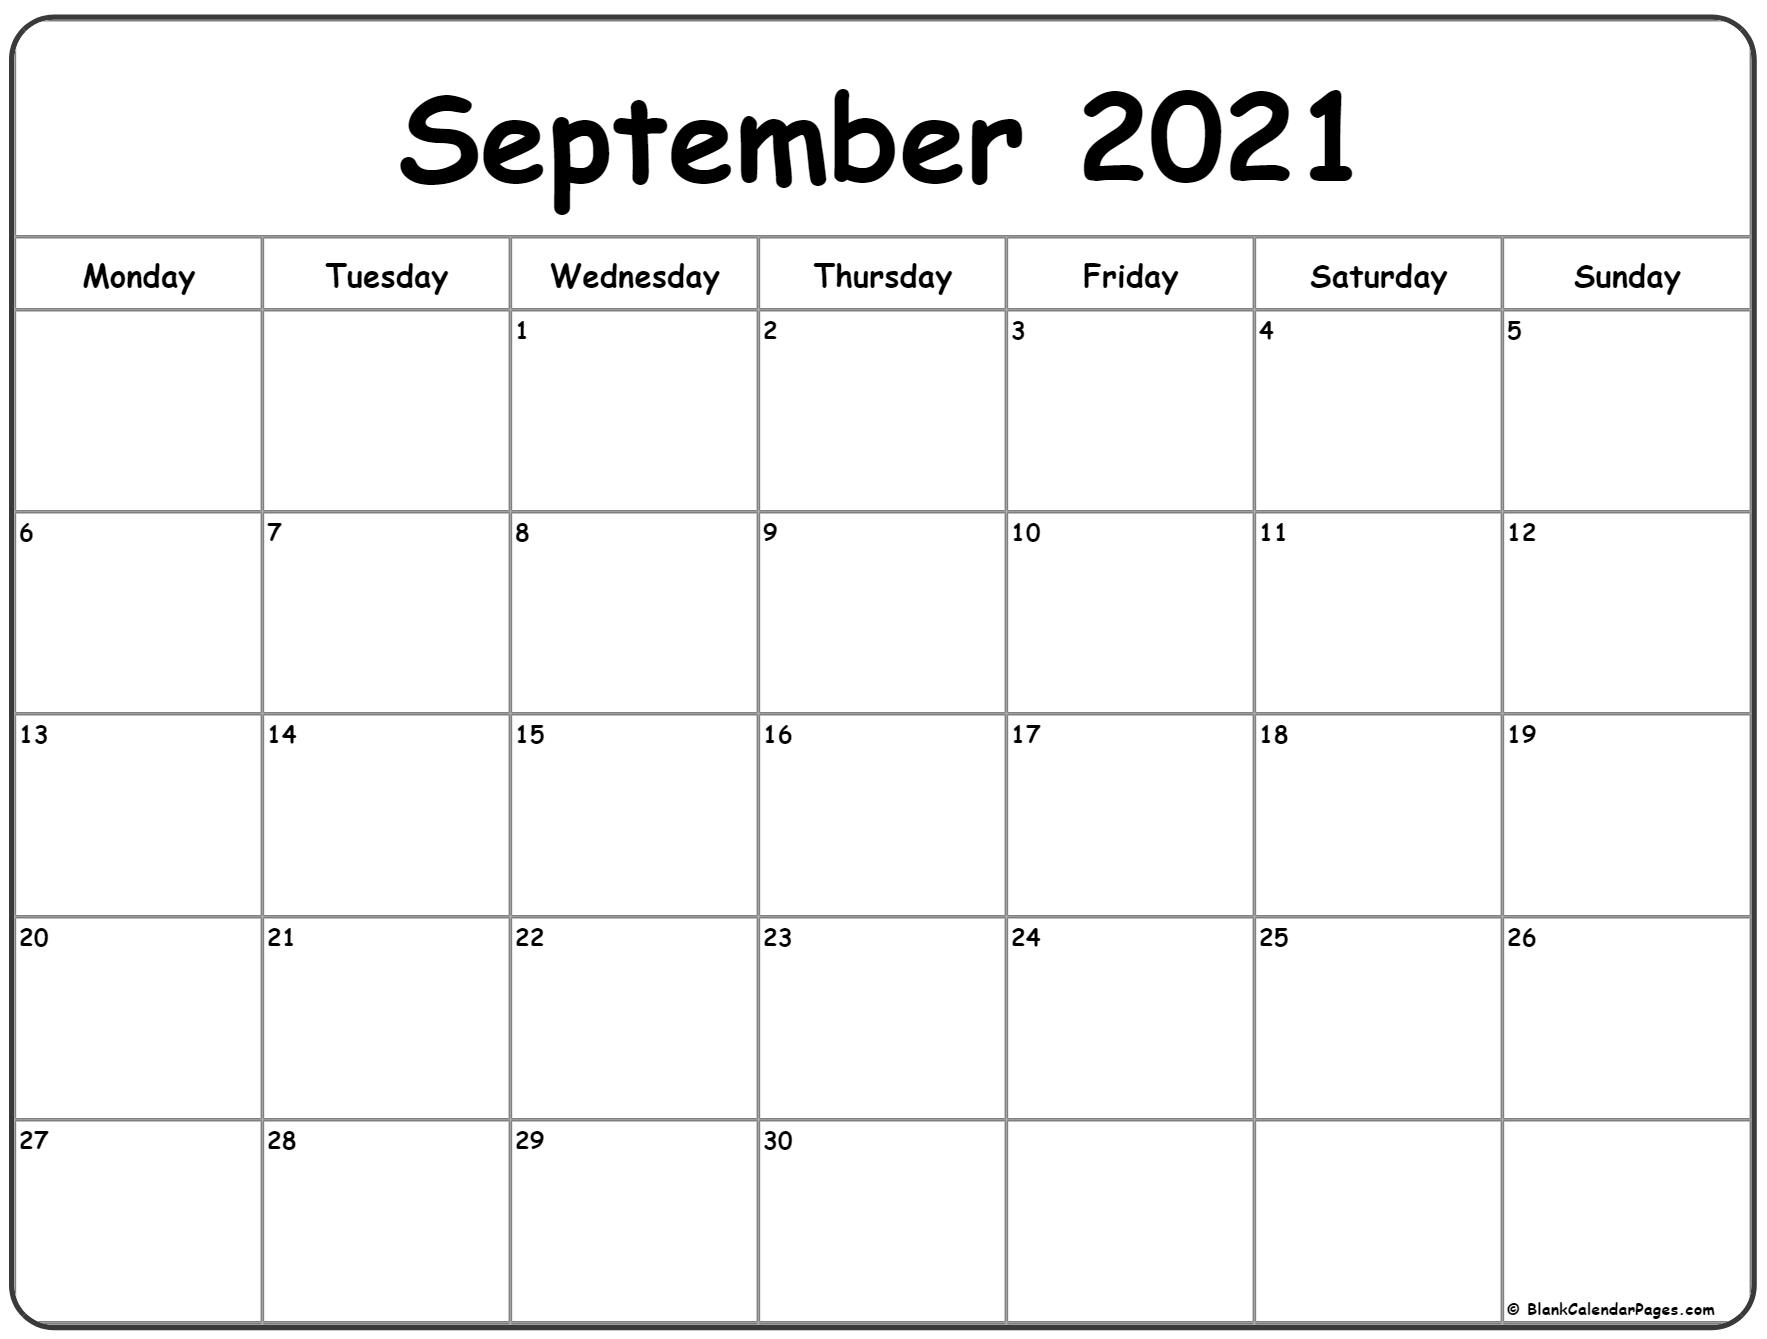 Get June - September 2021 Calendar Printable Free